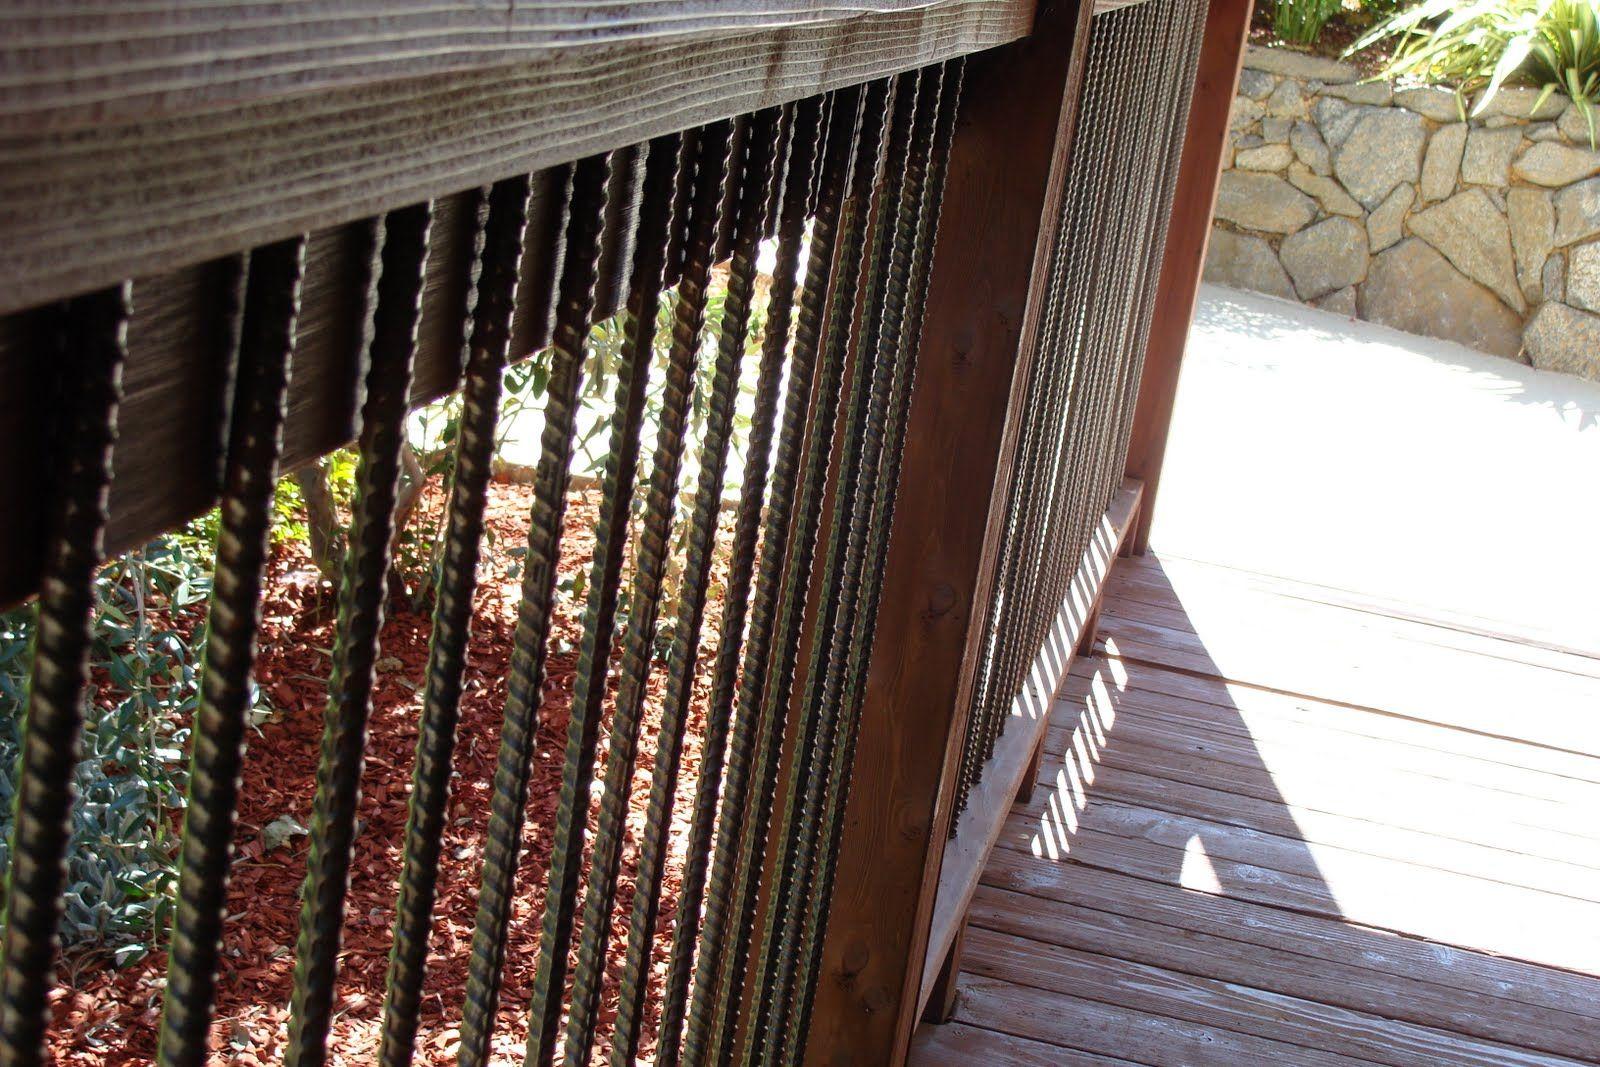 New 291 Jpg 1600 1067 Rebar Railing Deck Baers